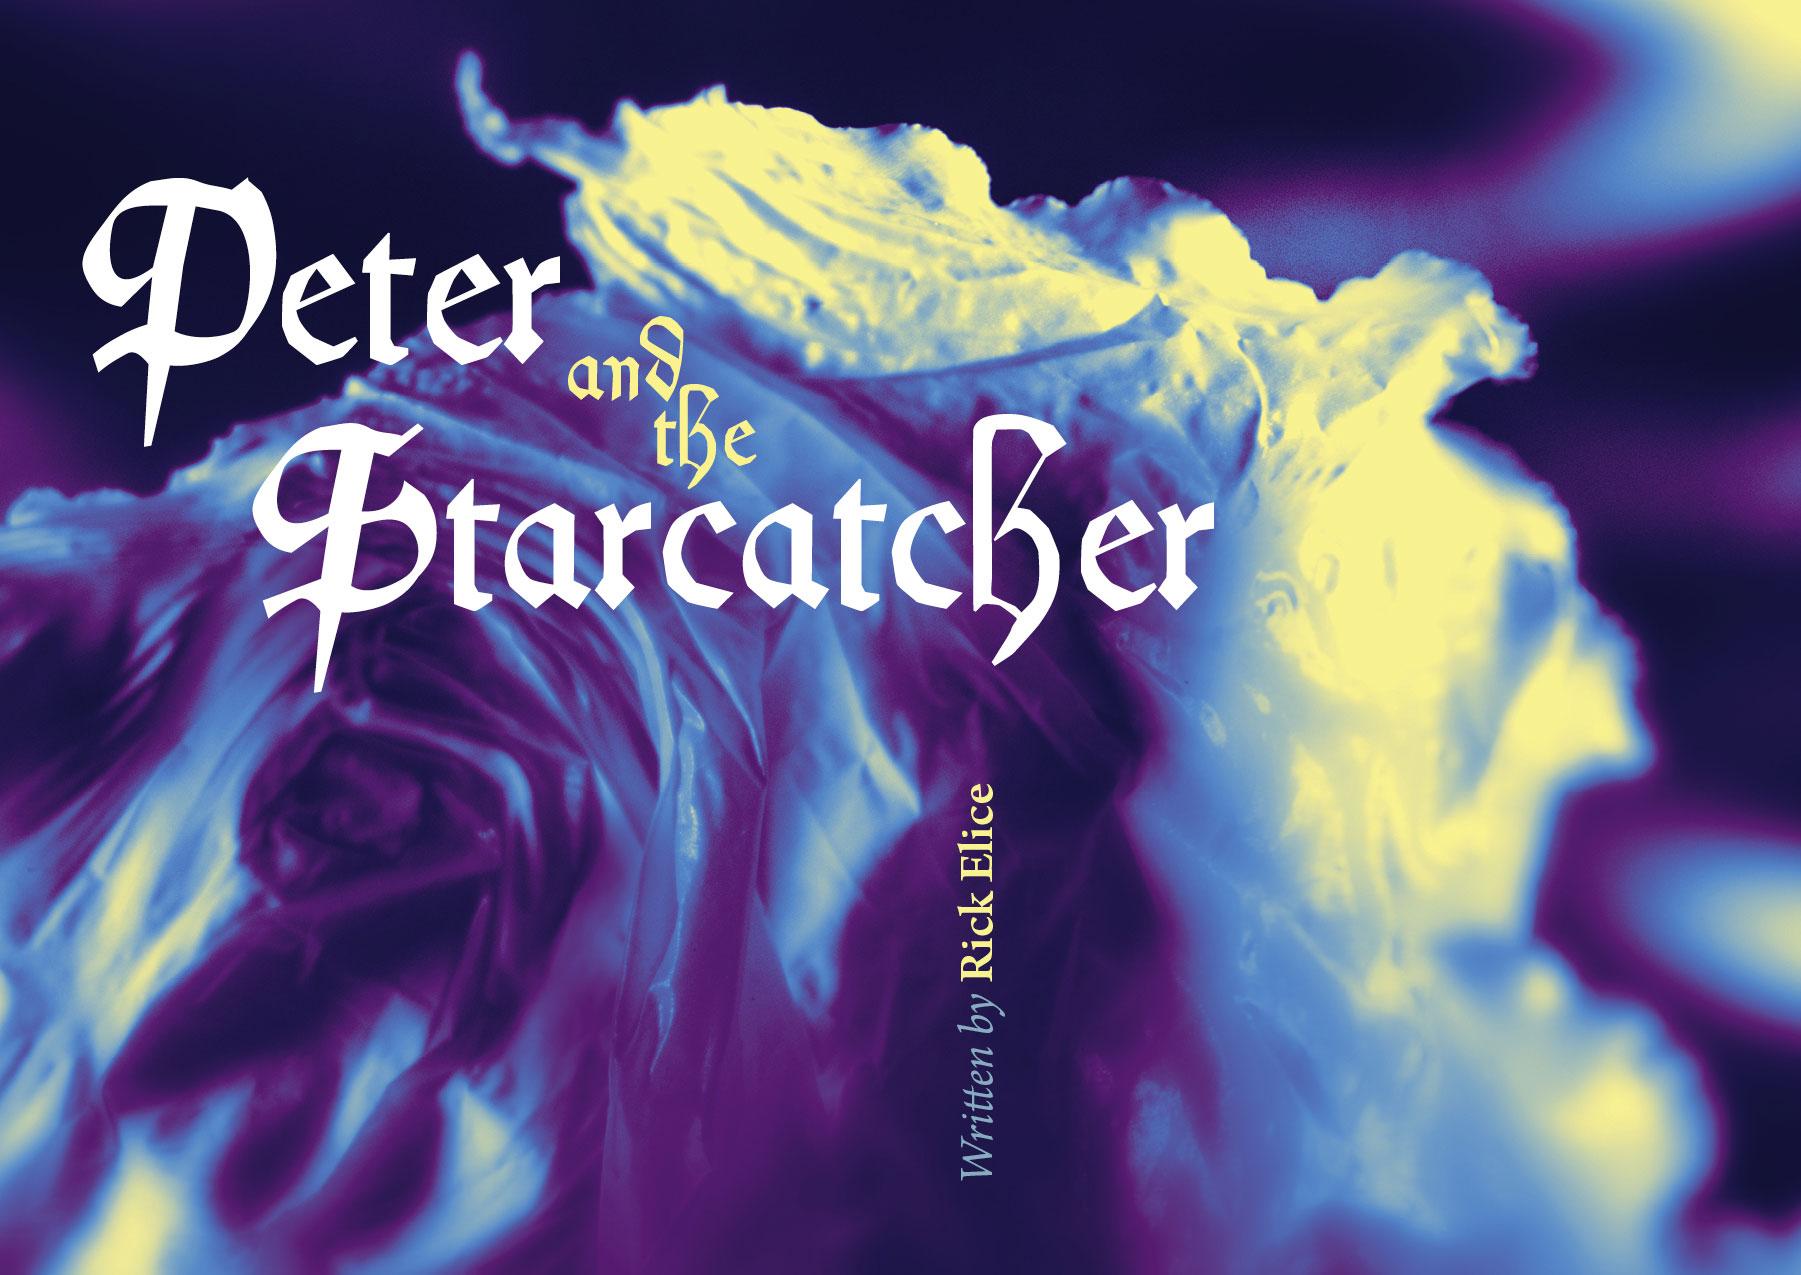 PeterStarCatcher3.jpg